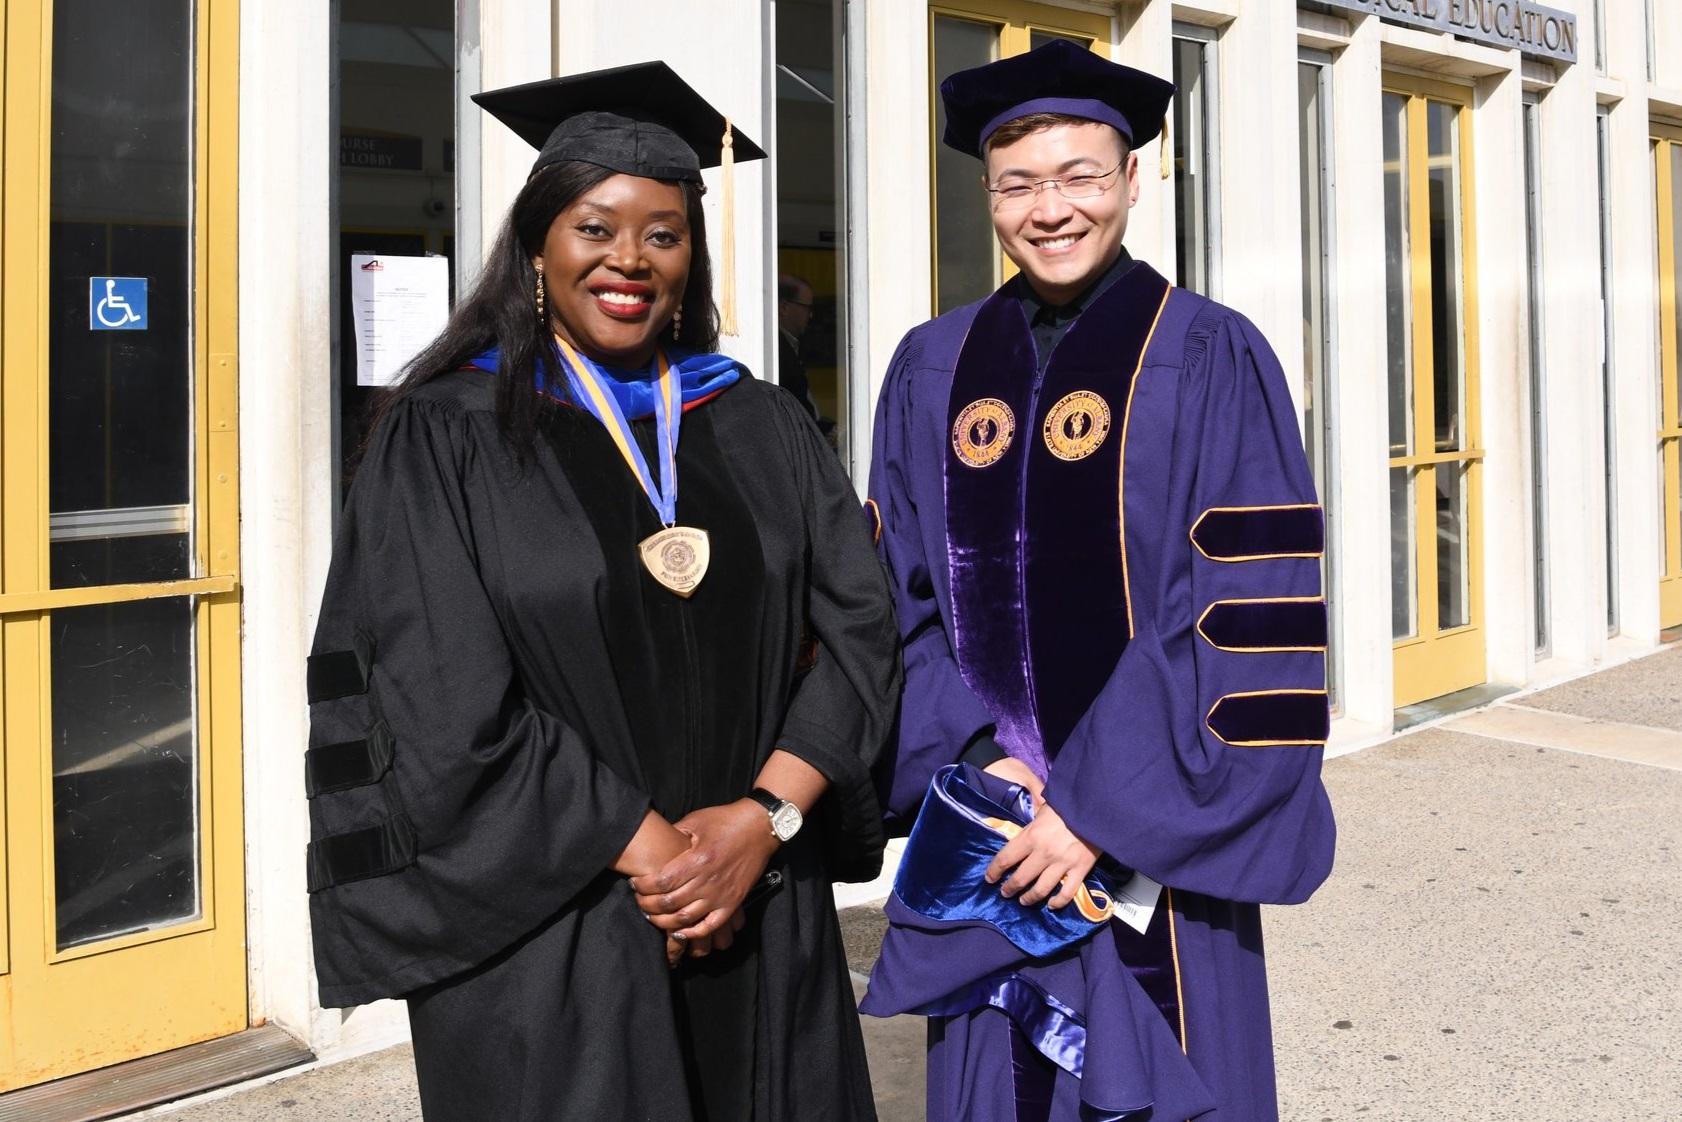 Professor Musah and Dr. Tianyu He.